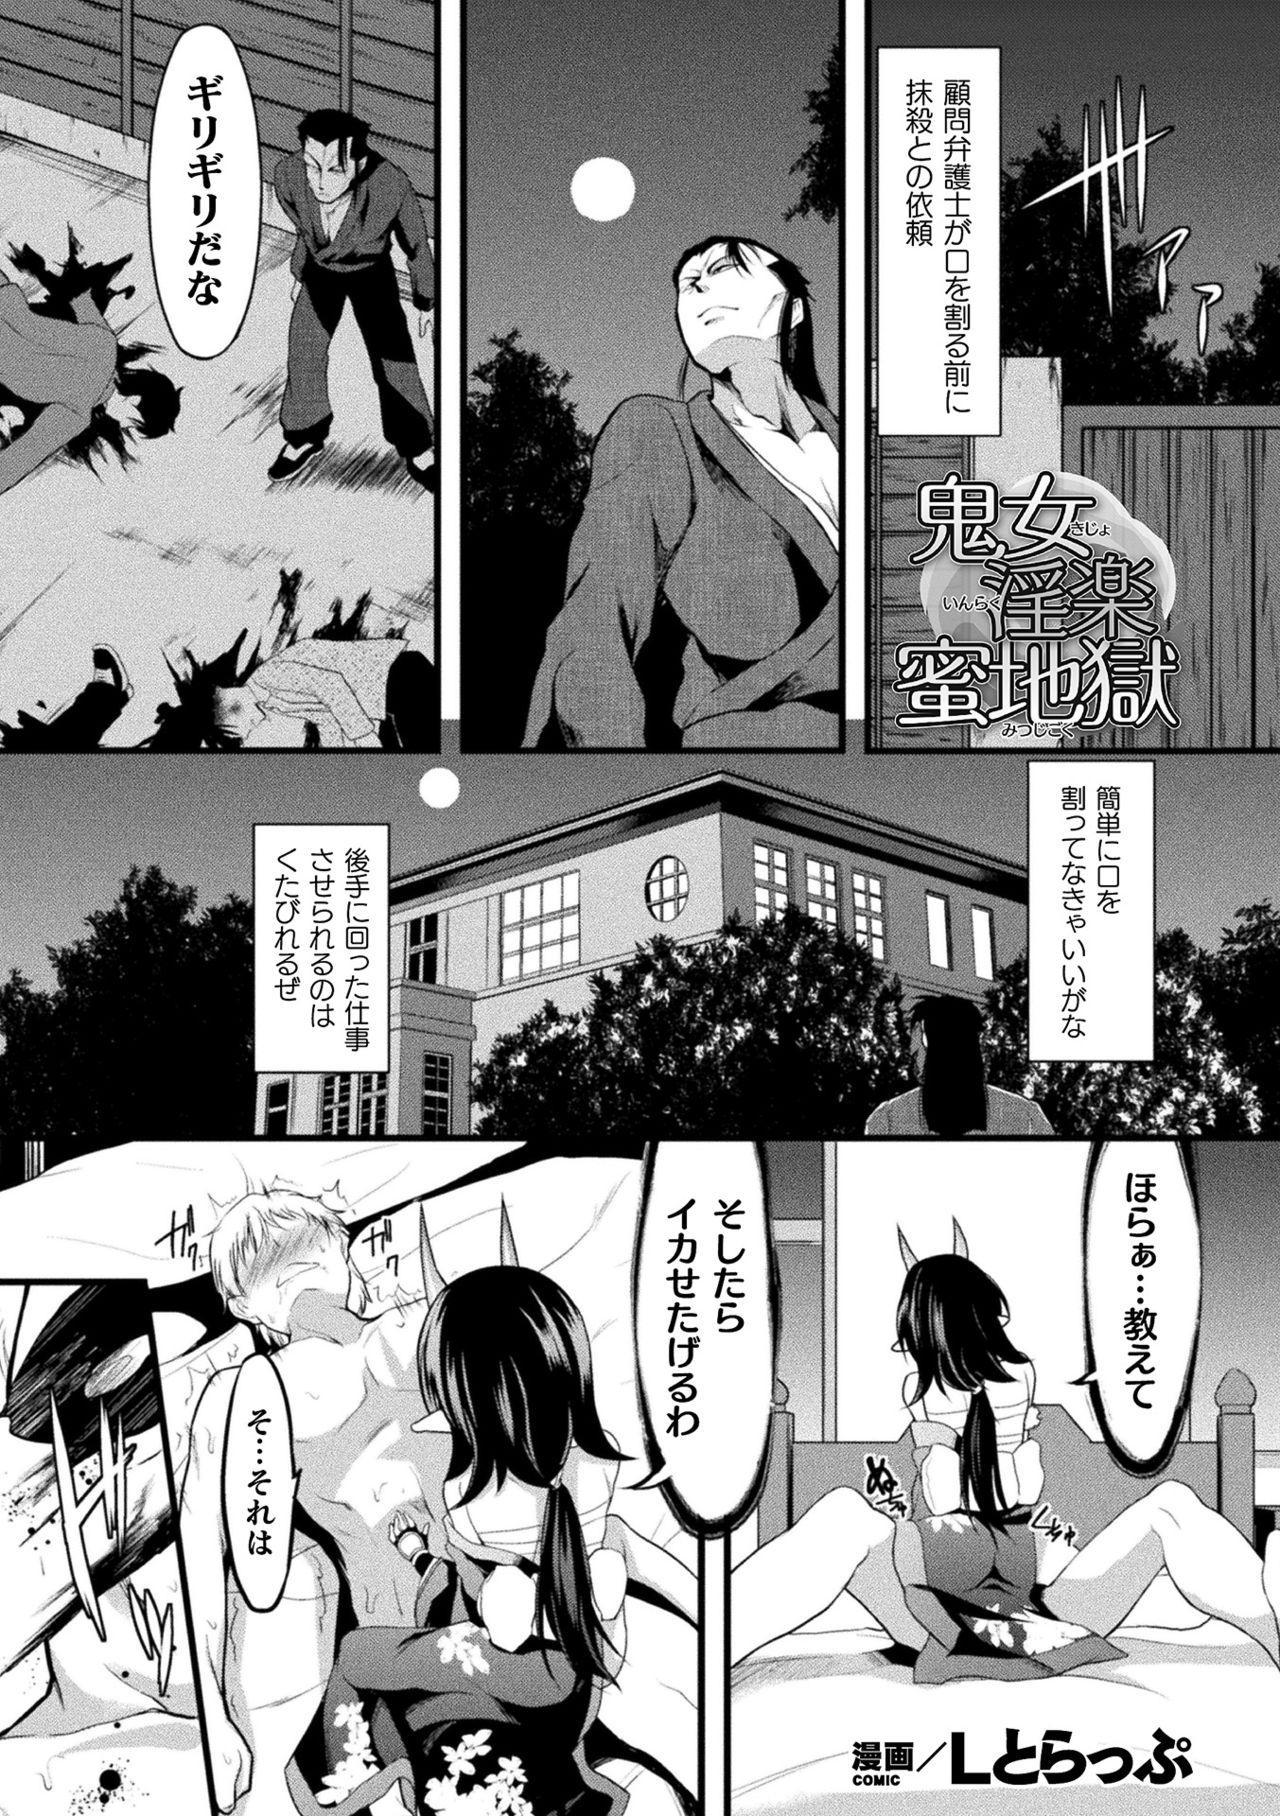 Loli-babaa Kyousei Tanetsuke Ecchi! Vol. 2 22